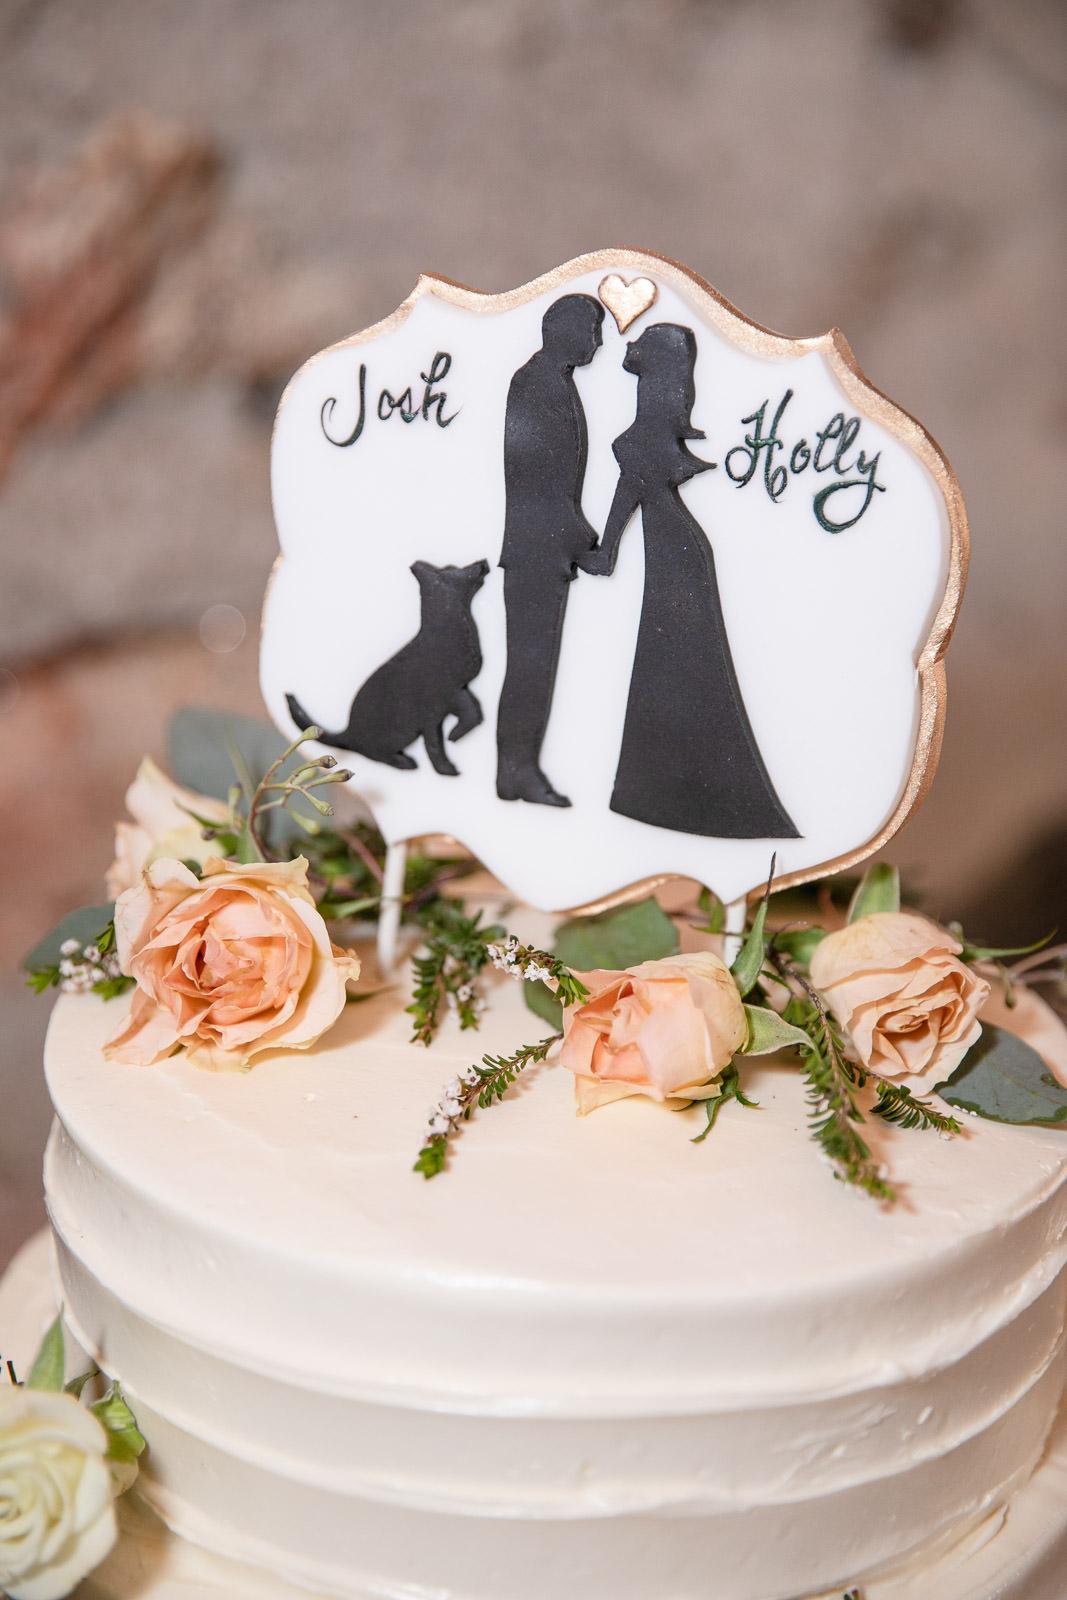 Wedding, Narragansett Towers, The Towers, Narragansett, Rhode Island, RI, Tracy Jenkins photography, RI wedding photographer, Rhode Island wedding photographer, wedding details, wedding cake, dog cake topper